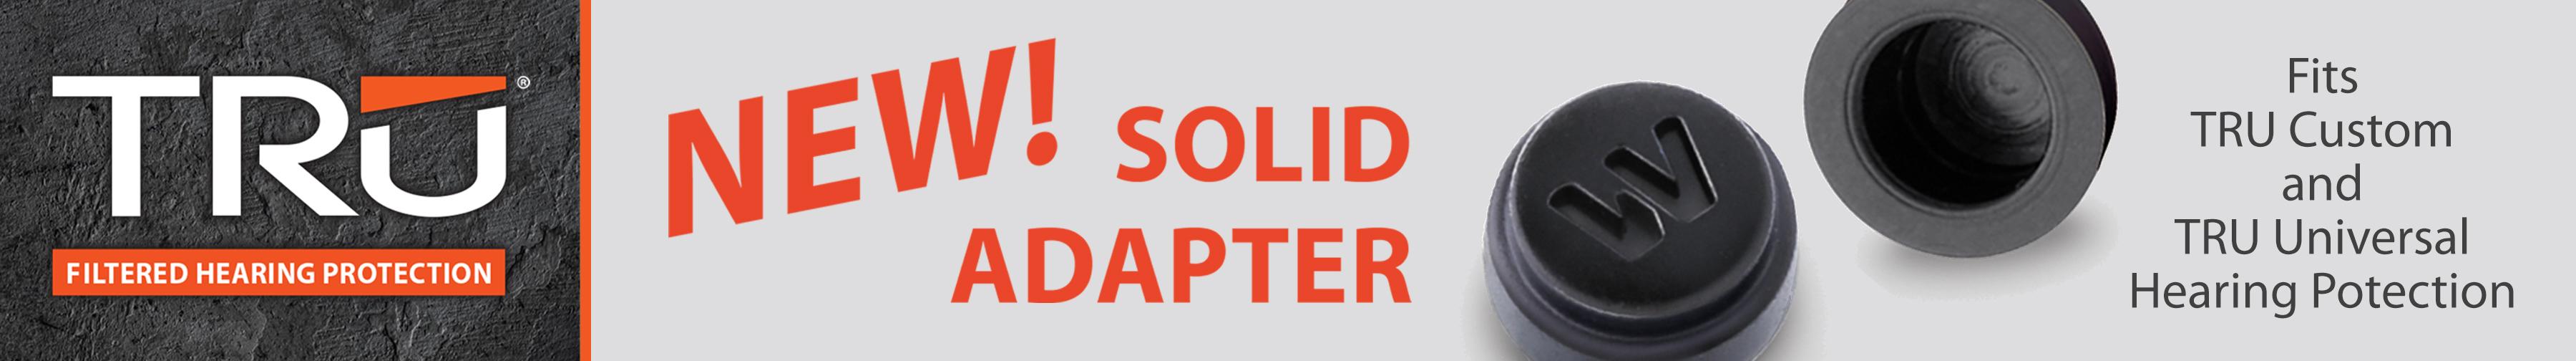 Westone TRU Solid Adapter